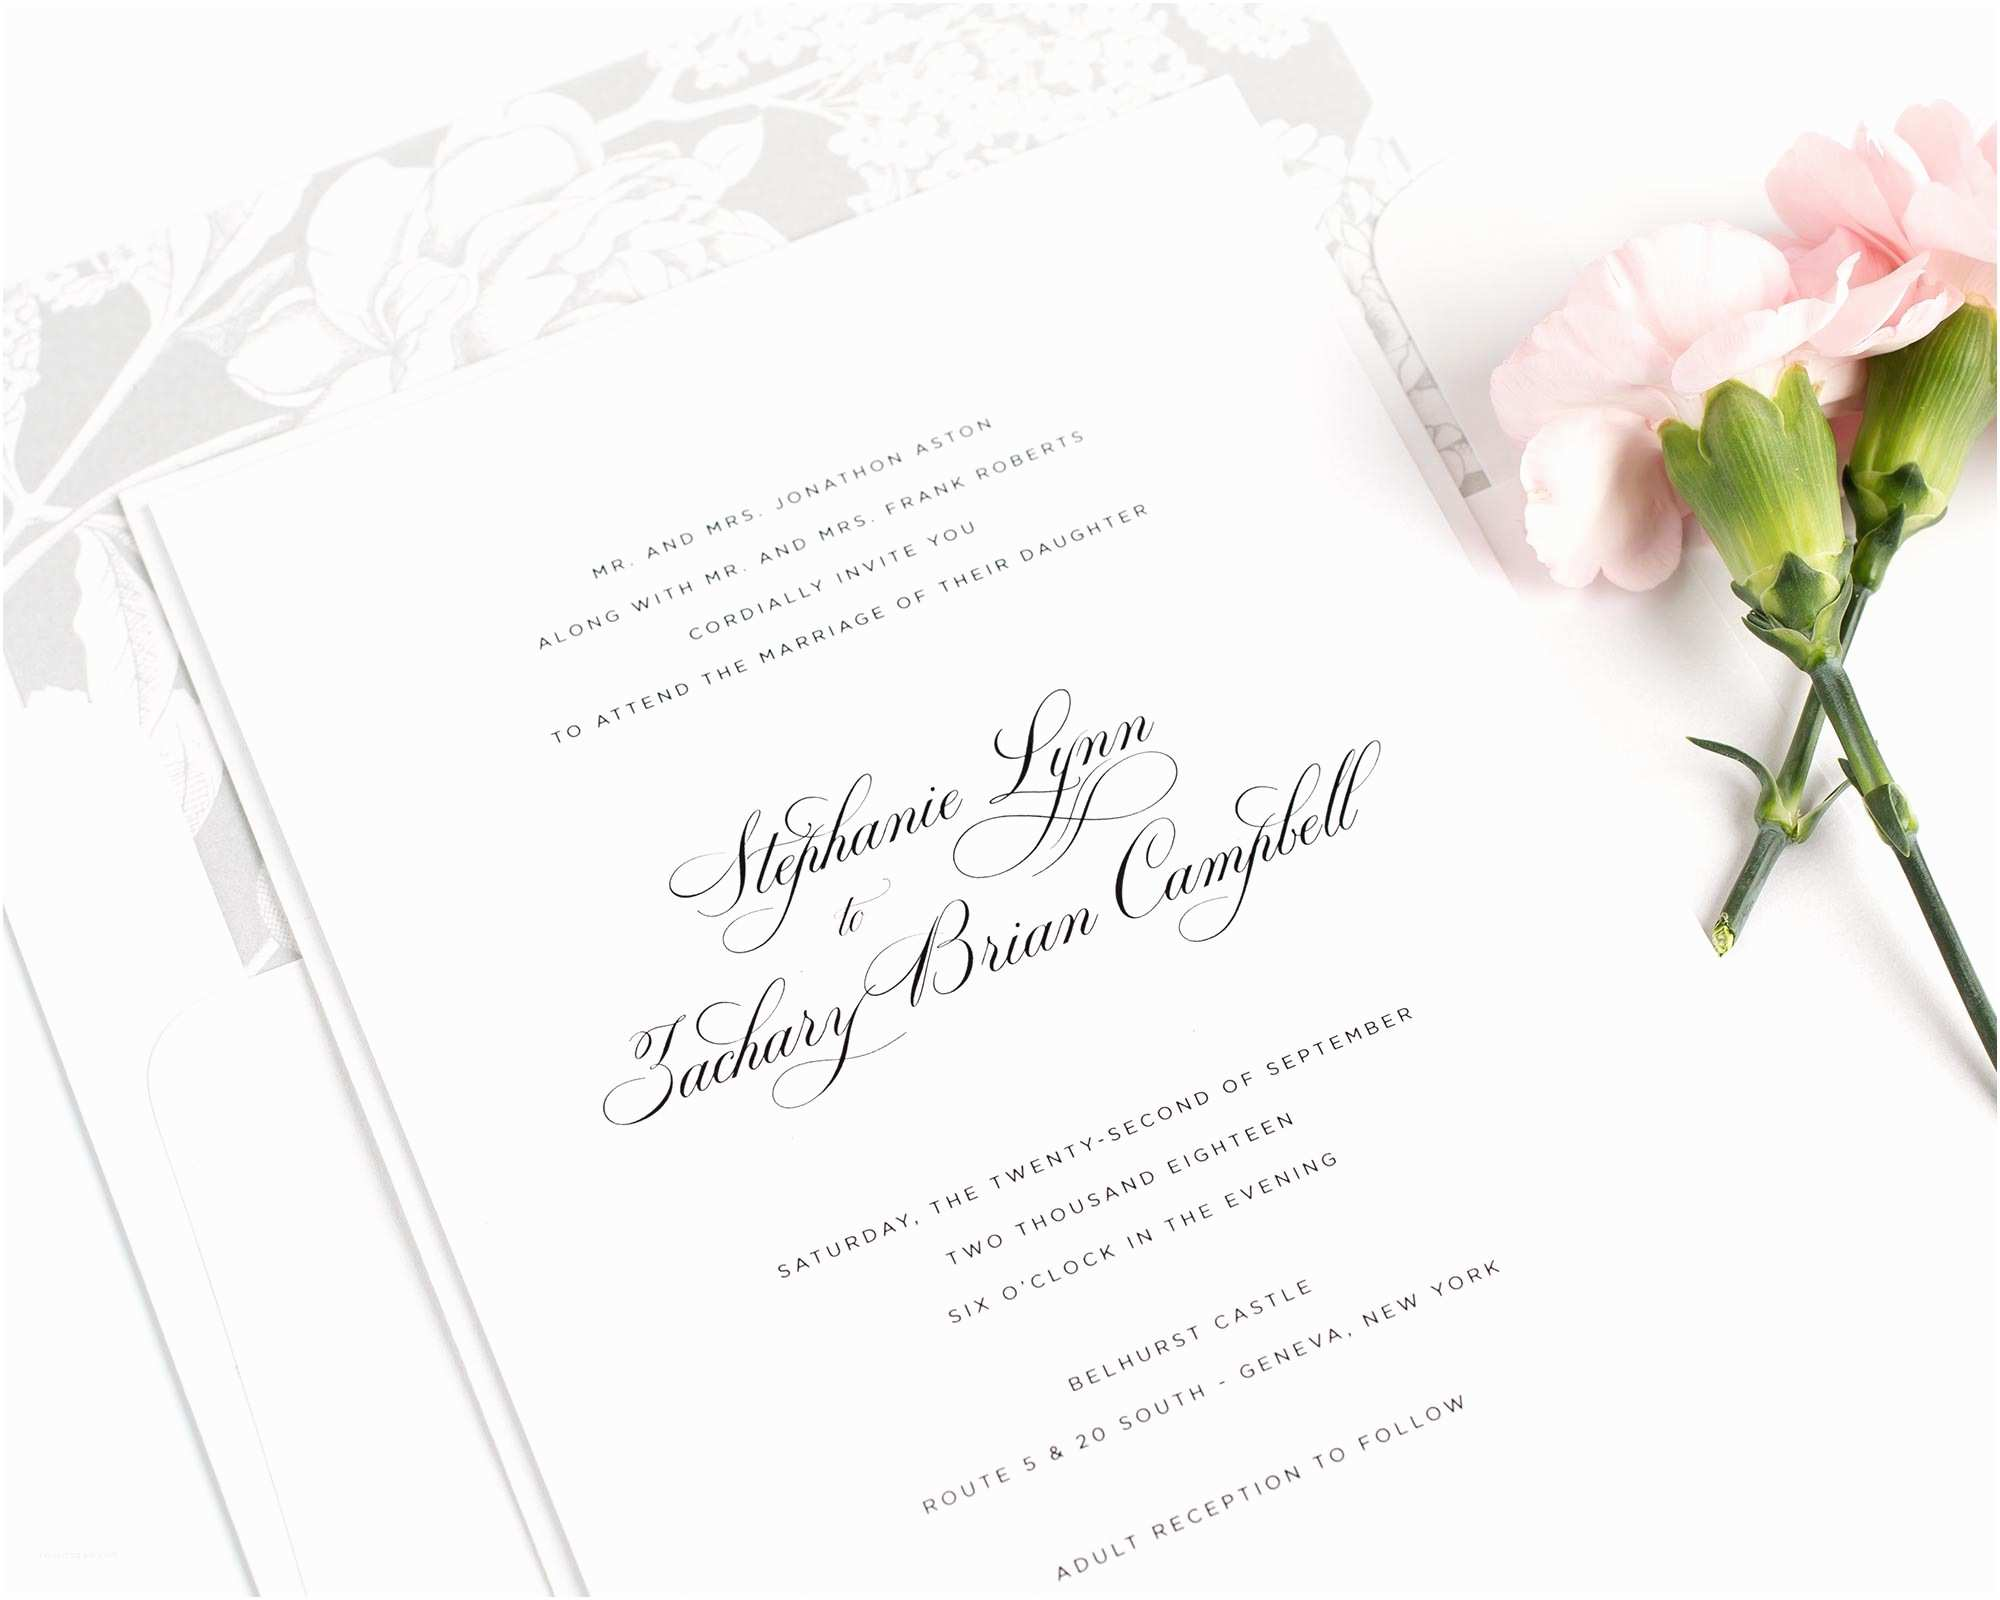 Elegant Silver Wedding Invitations Delicate Wedding Invitations In Silver – Wedding Invitations